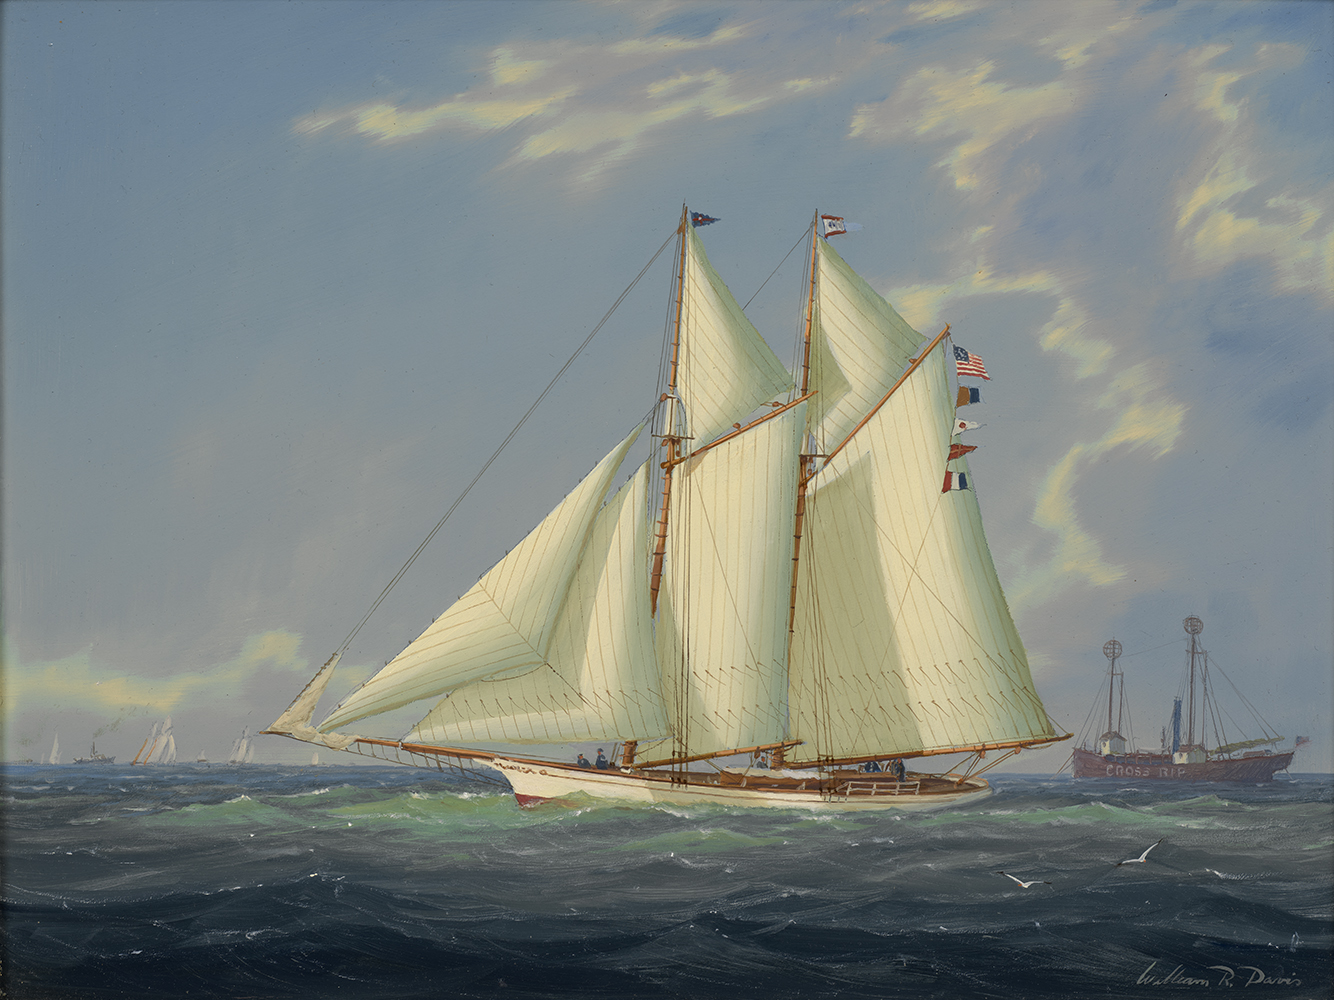 william_davis_w1009_yacht_peerless_new_york_yacht_club_squadron_race_1892.jpg